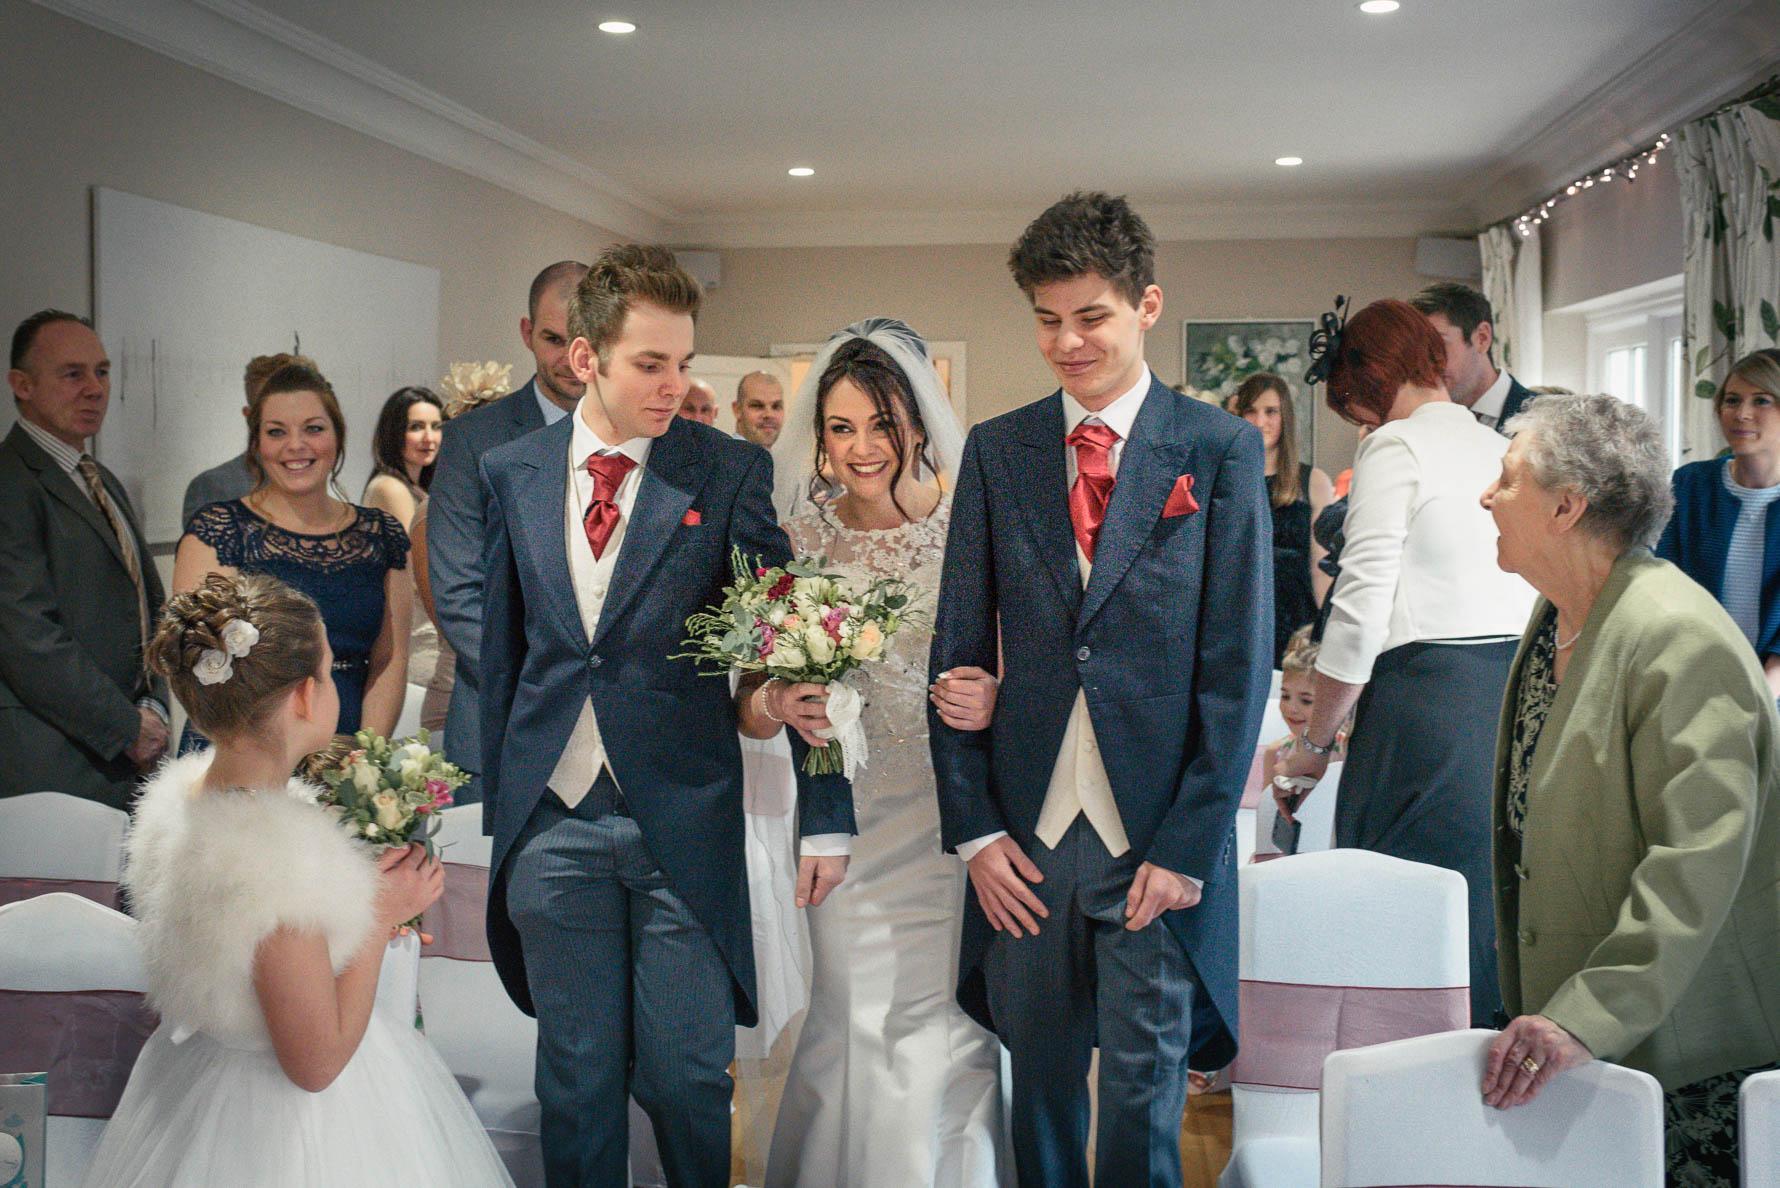 Hadlow Manor Wedding-37.jpg